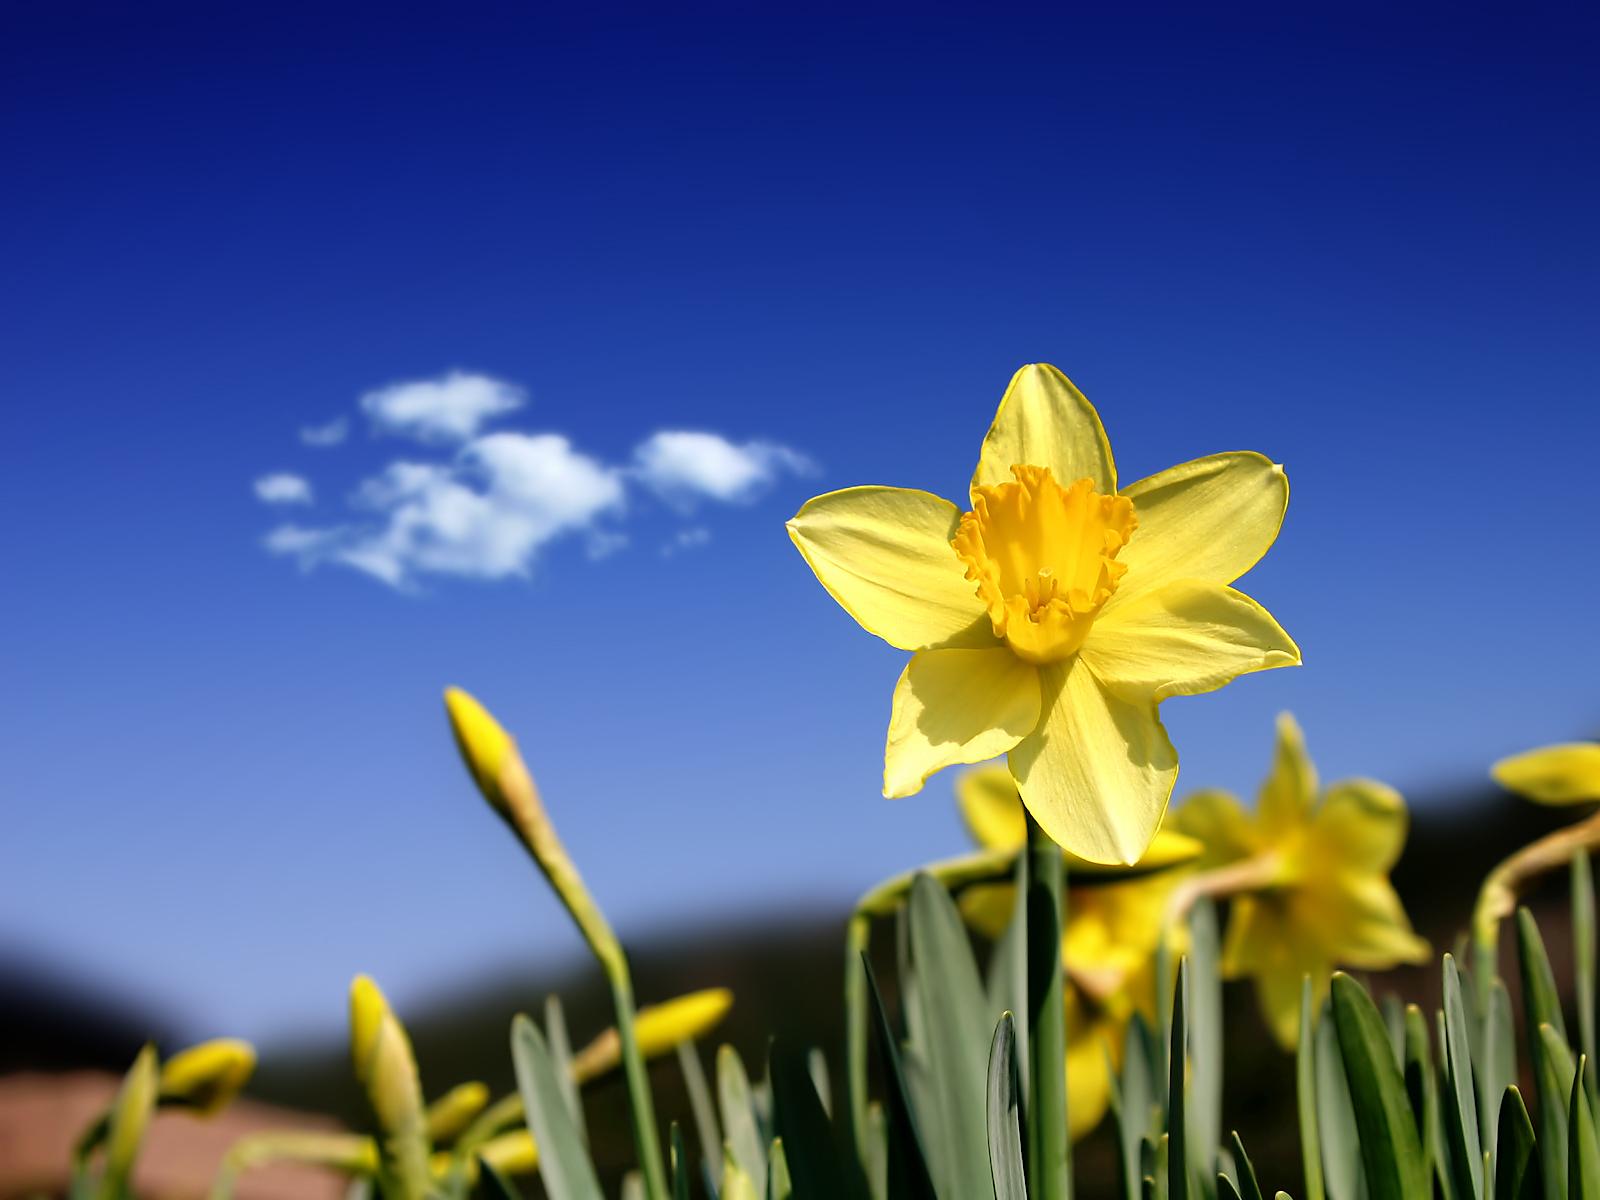 daffodils flower wallpaper